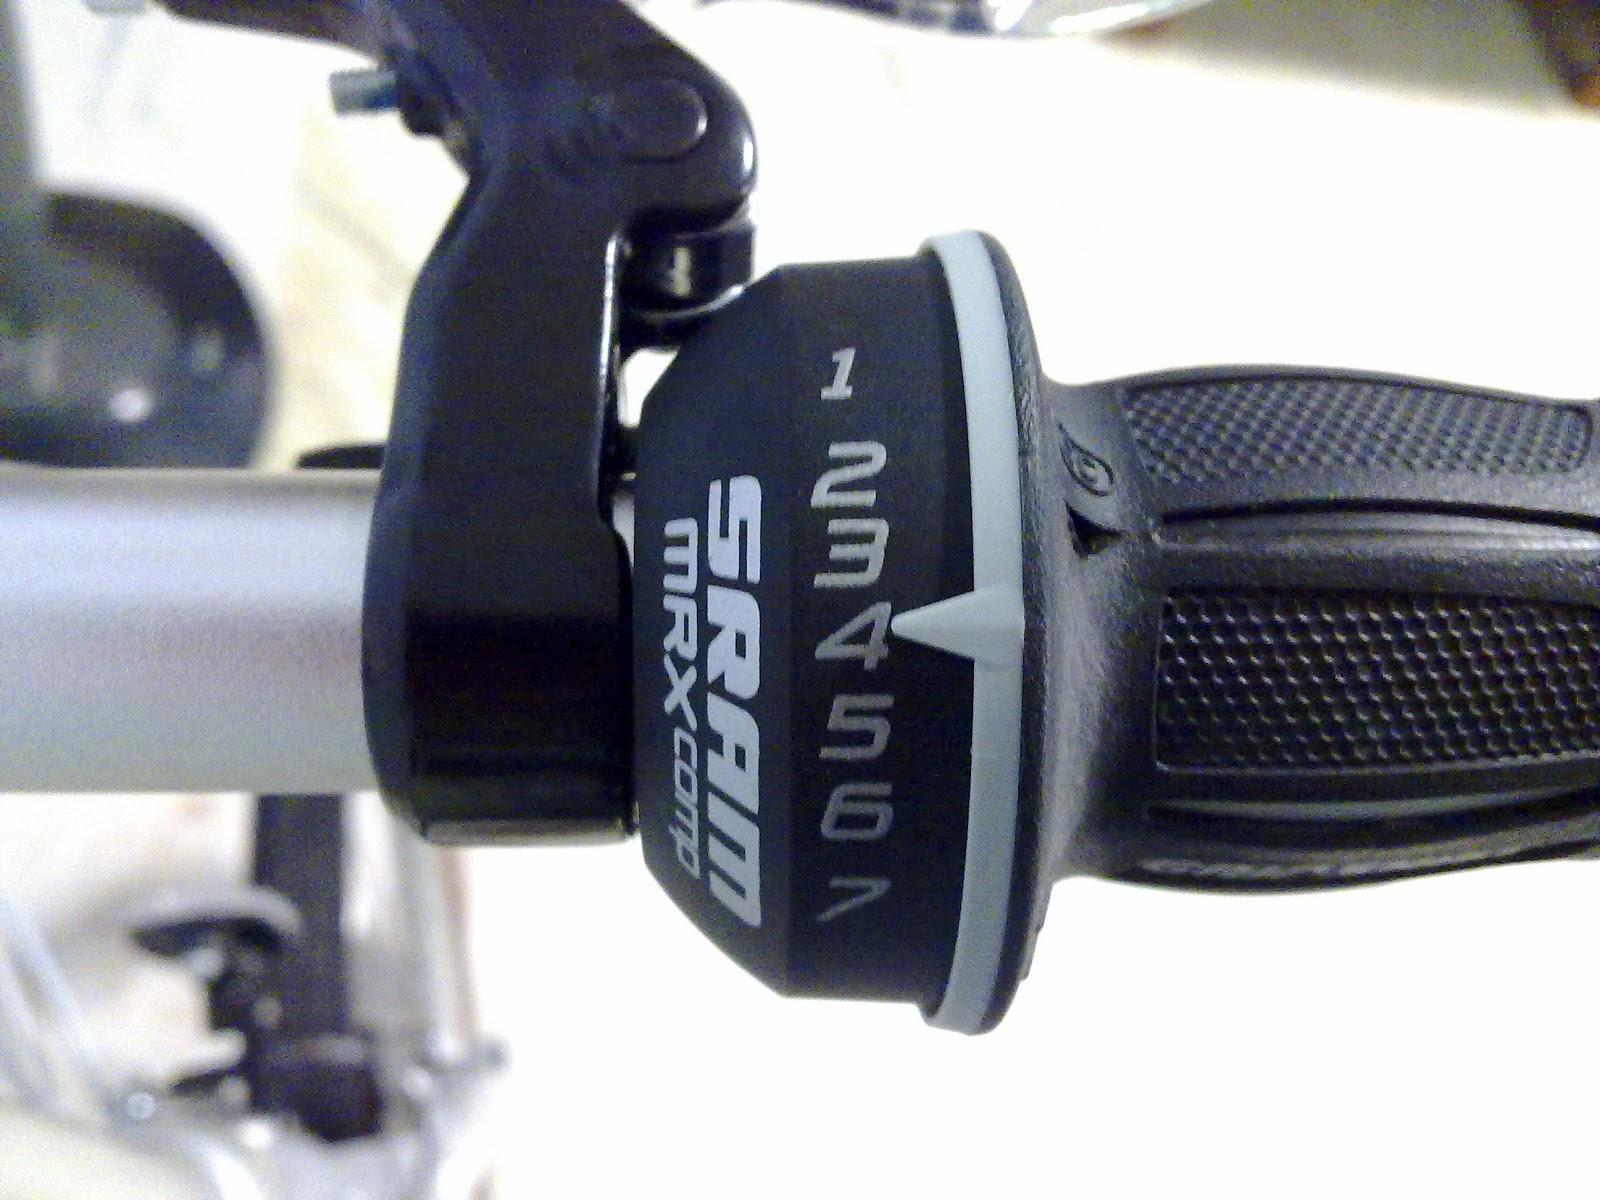 Hands On Bike Guide To Upgrading Your Dahon Tern Folding Bike